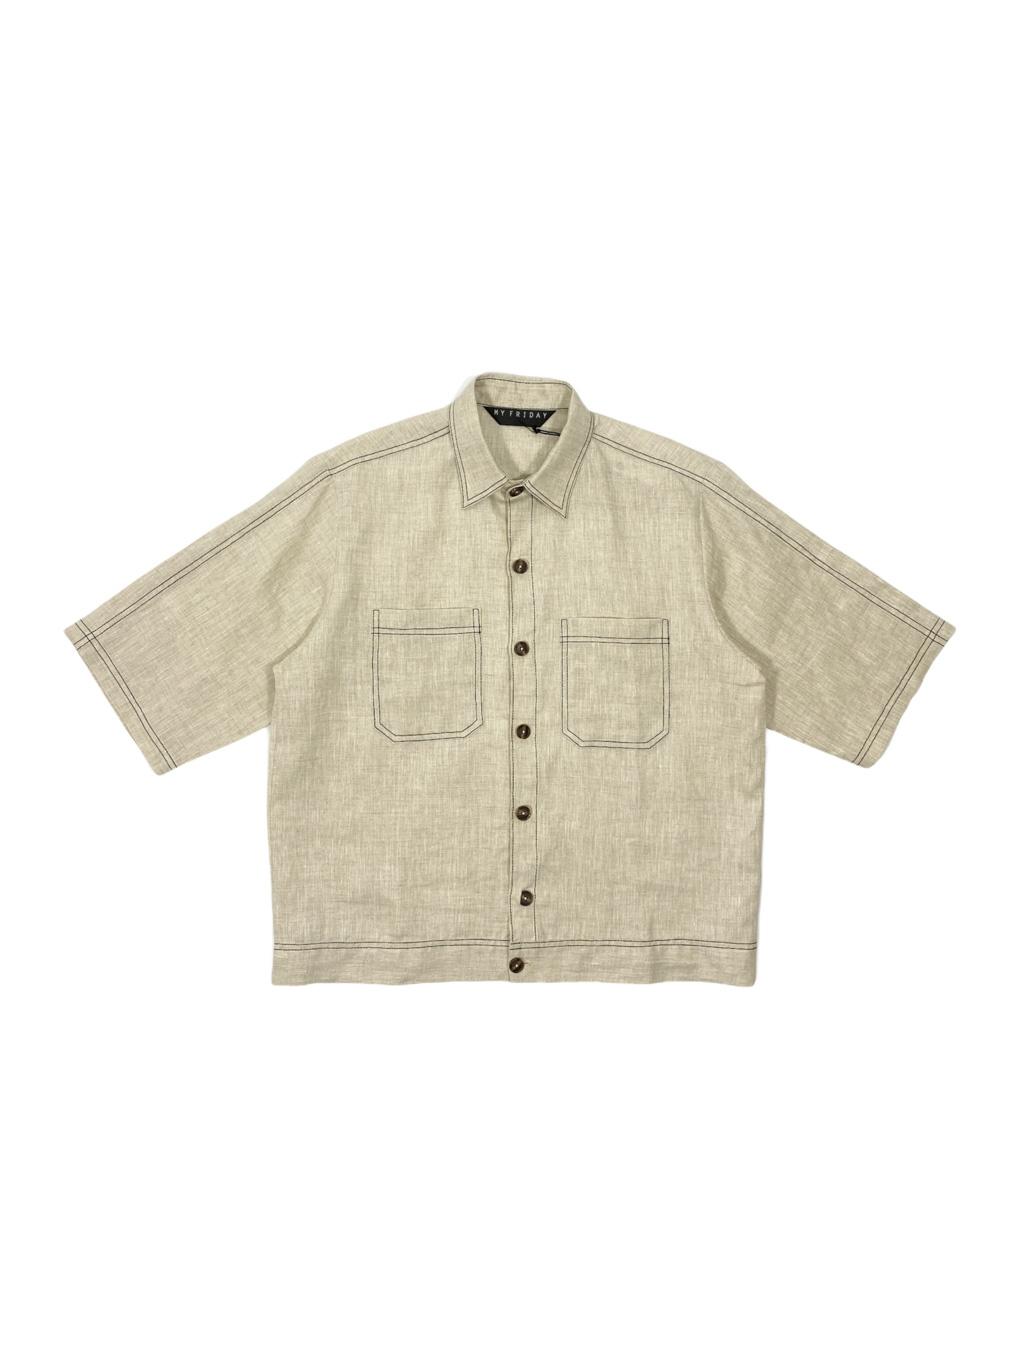 Short Sleeve Jacket (Beige)